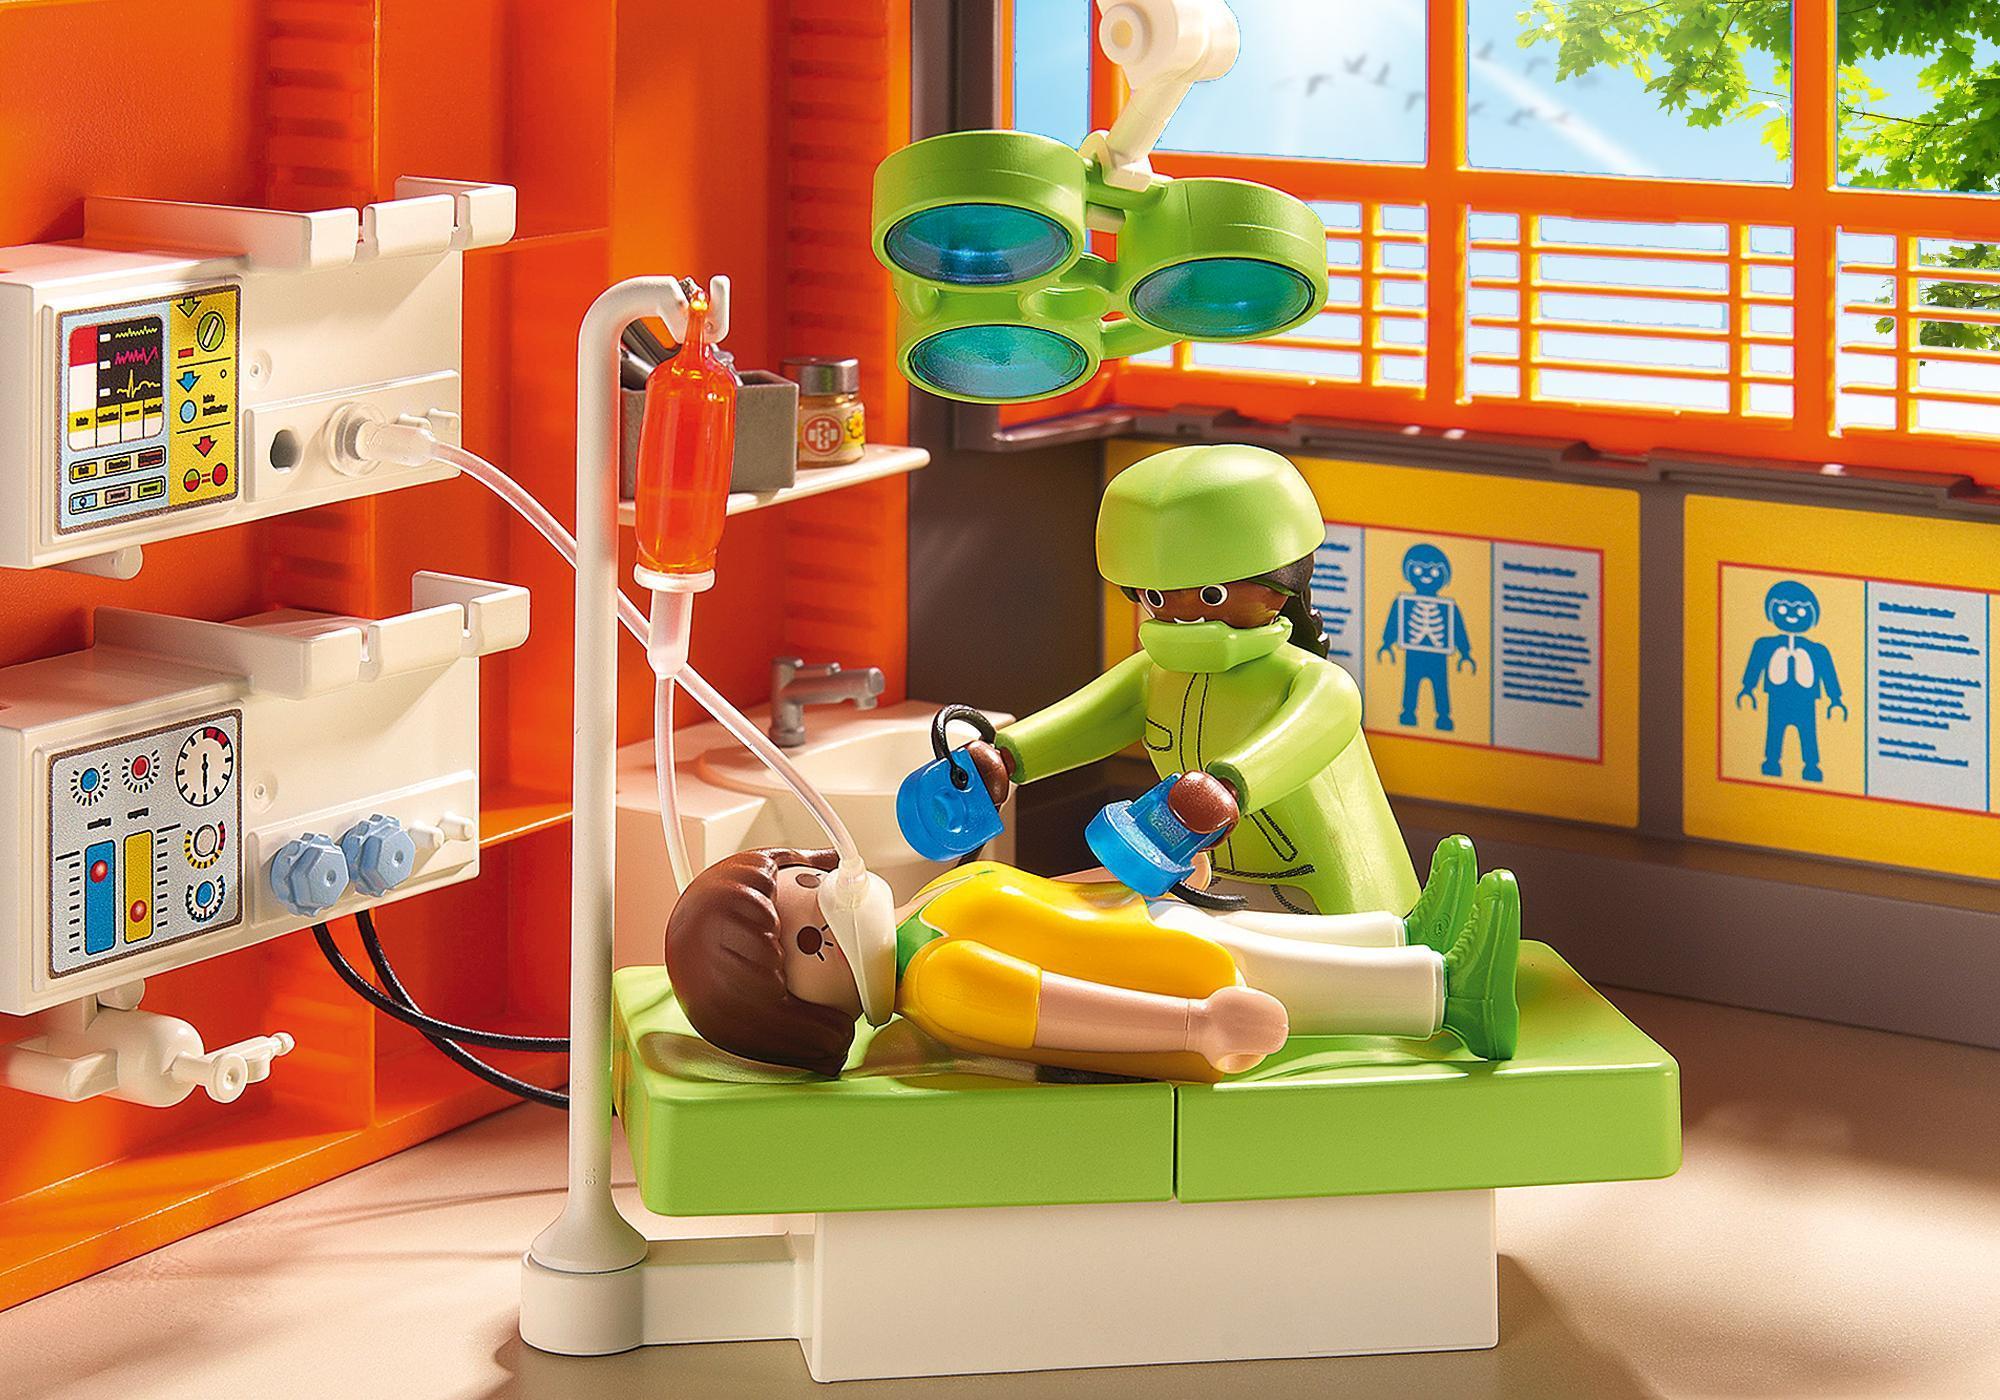 http://media.playmobil.com/i/playmobil/6657_product_extra1/Furnished Children's Hospital